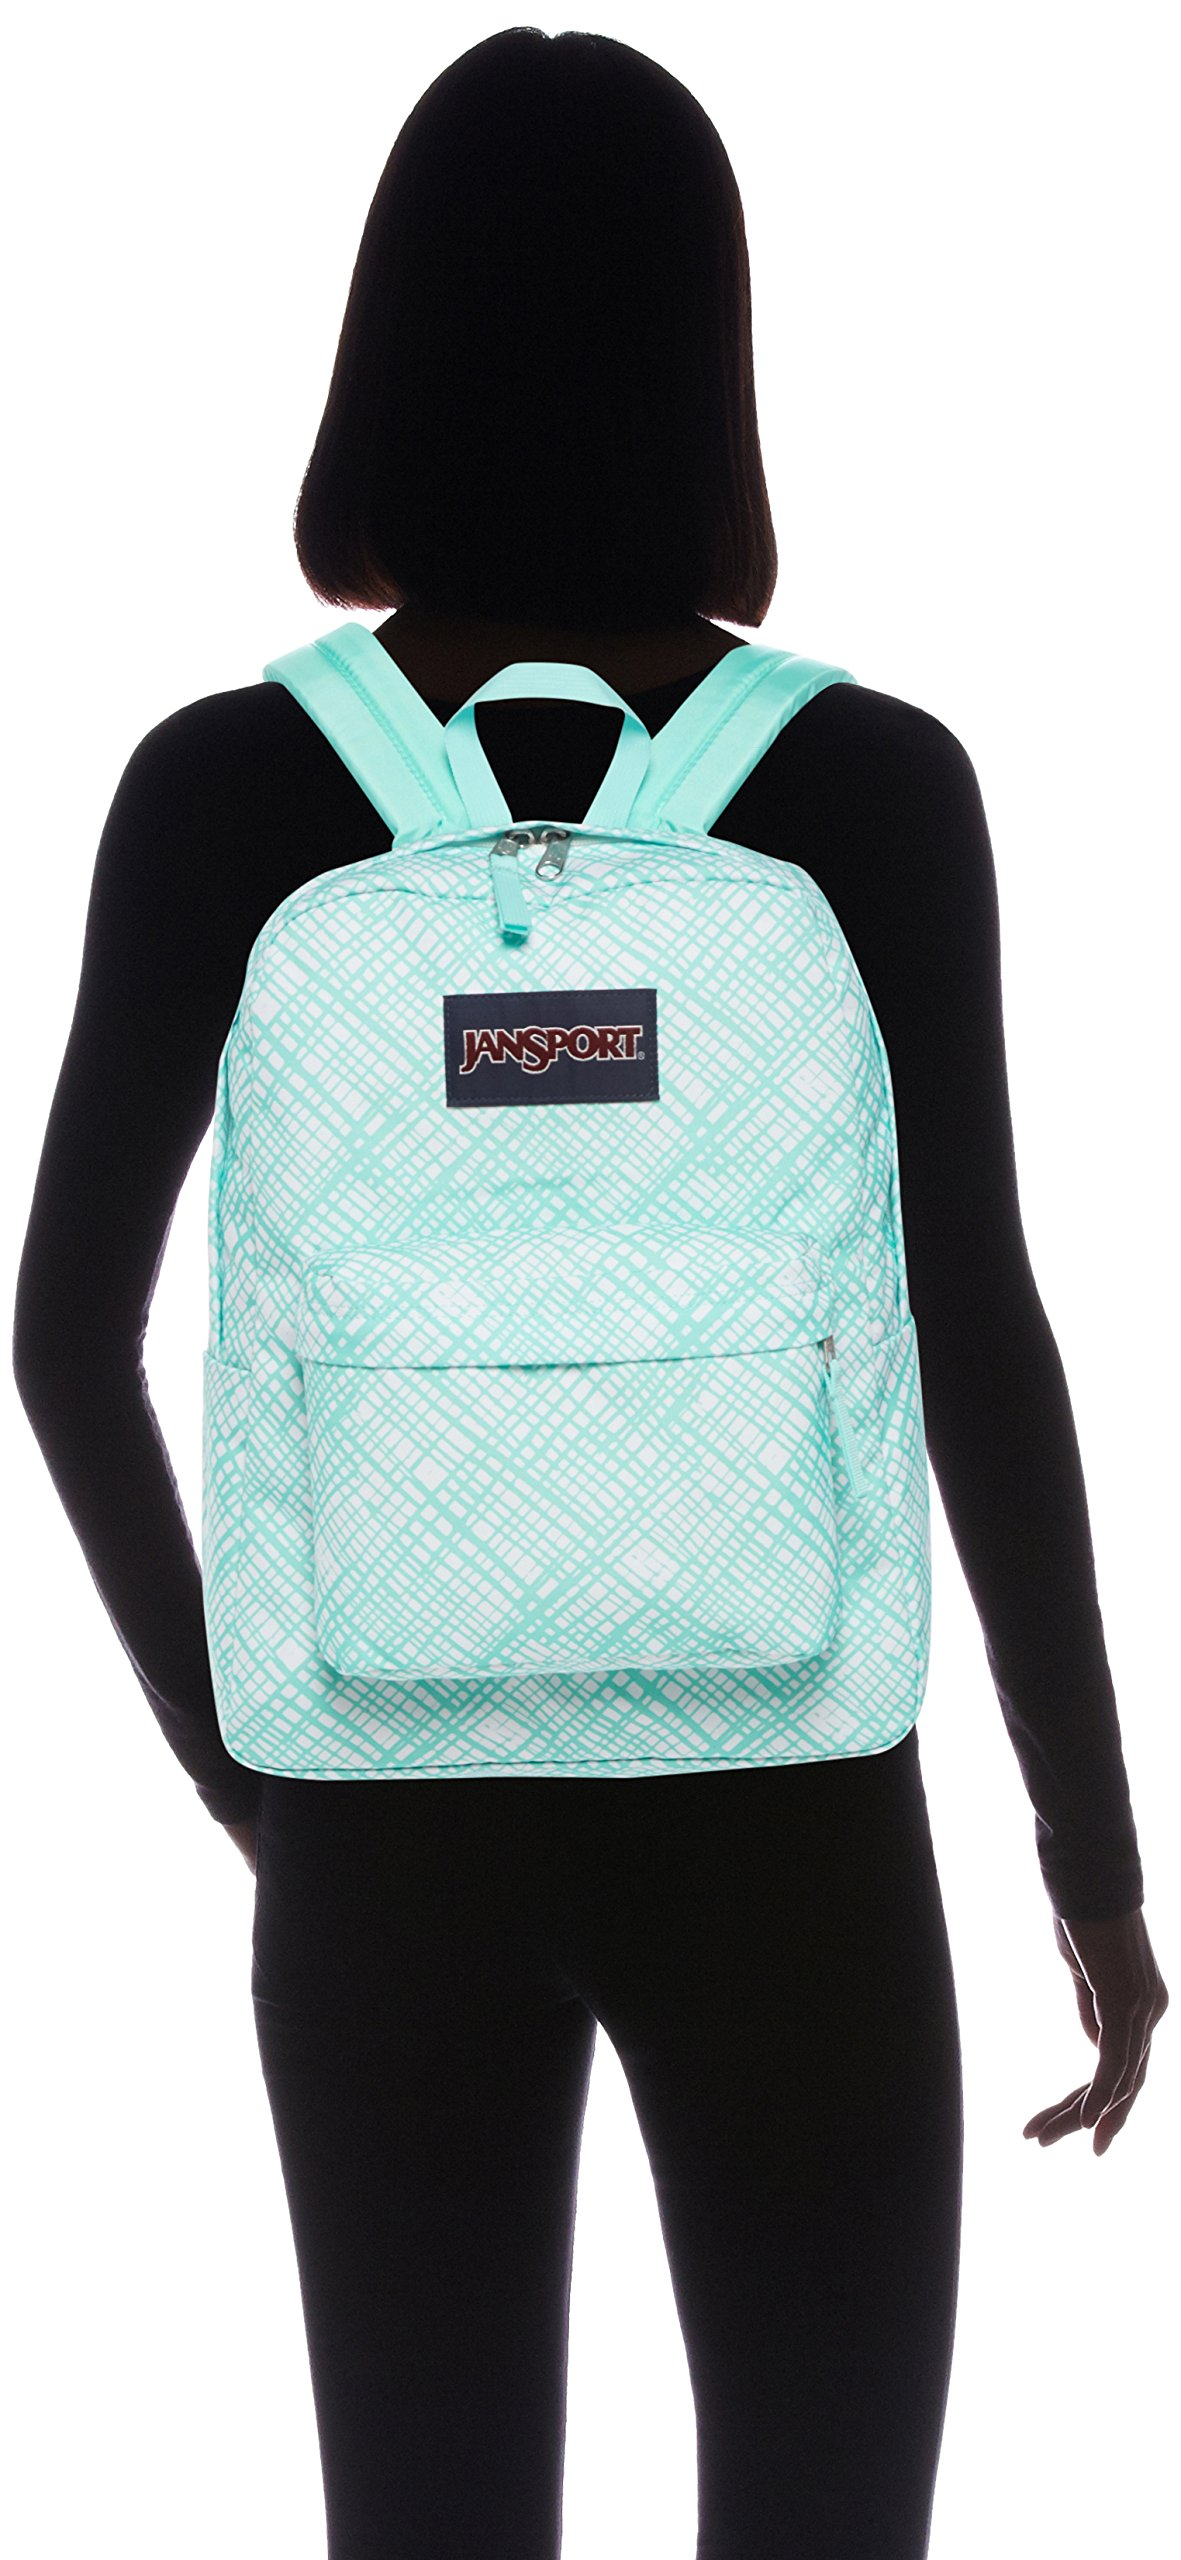 JanSport Womens Classic Mainstream Superbreak Backpack - Aqua Dash Jagged Plaid / 16.7'' H X 13'' W X 8.5'' D by JanSport (Image #4)